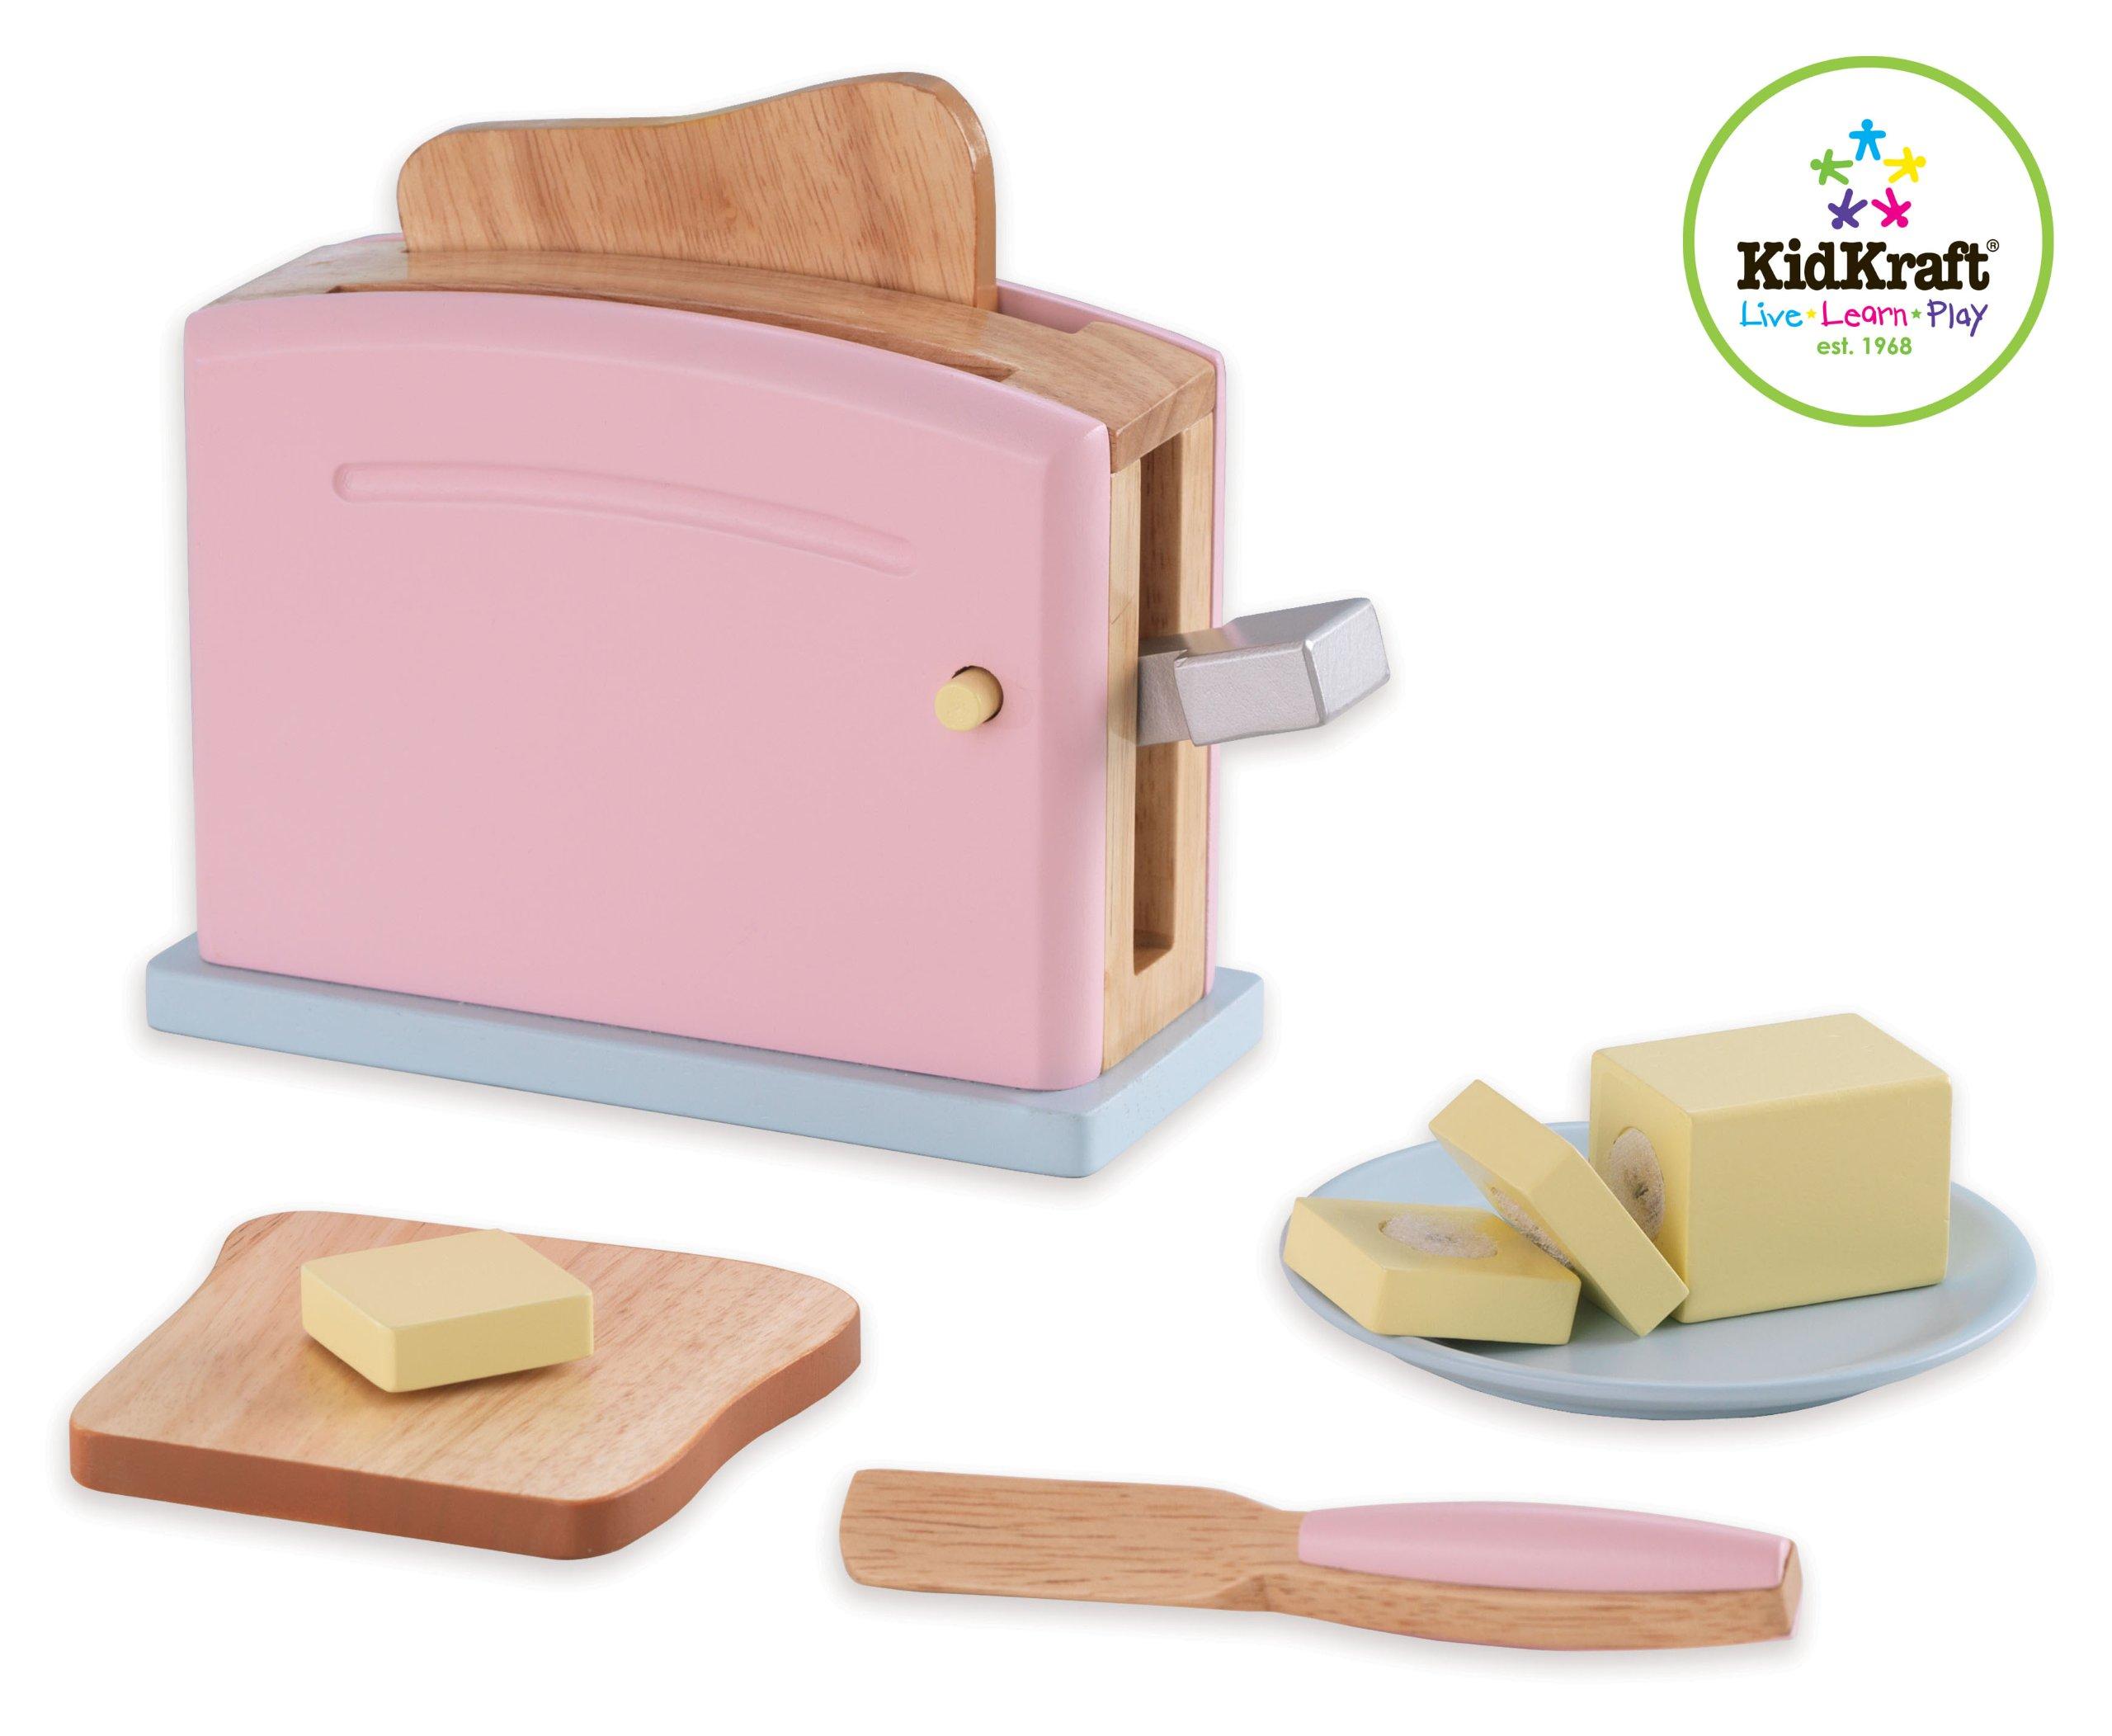 KidKraft Wooden New Toaster Set - Pastel by KidKraft (Image #3)